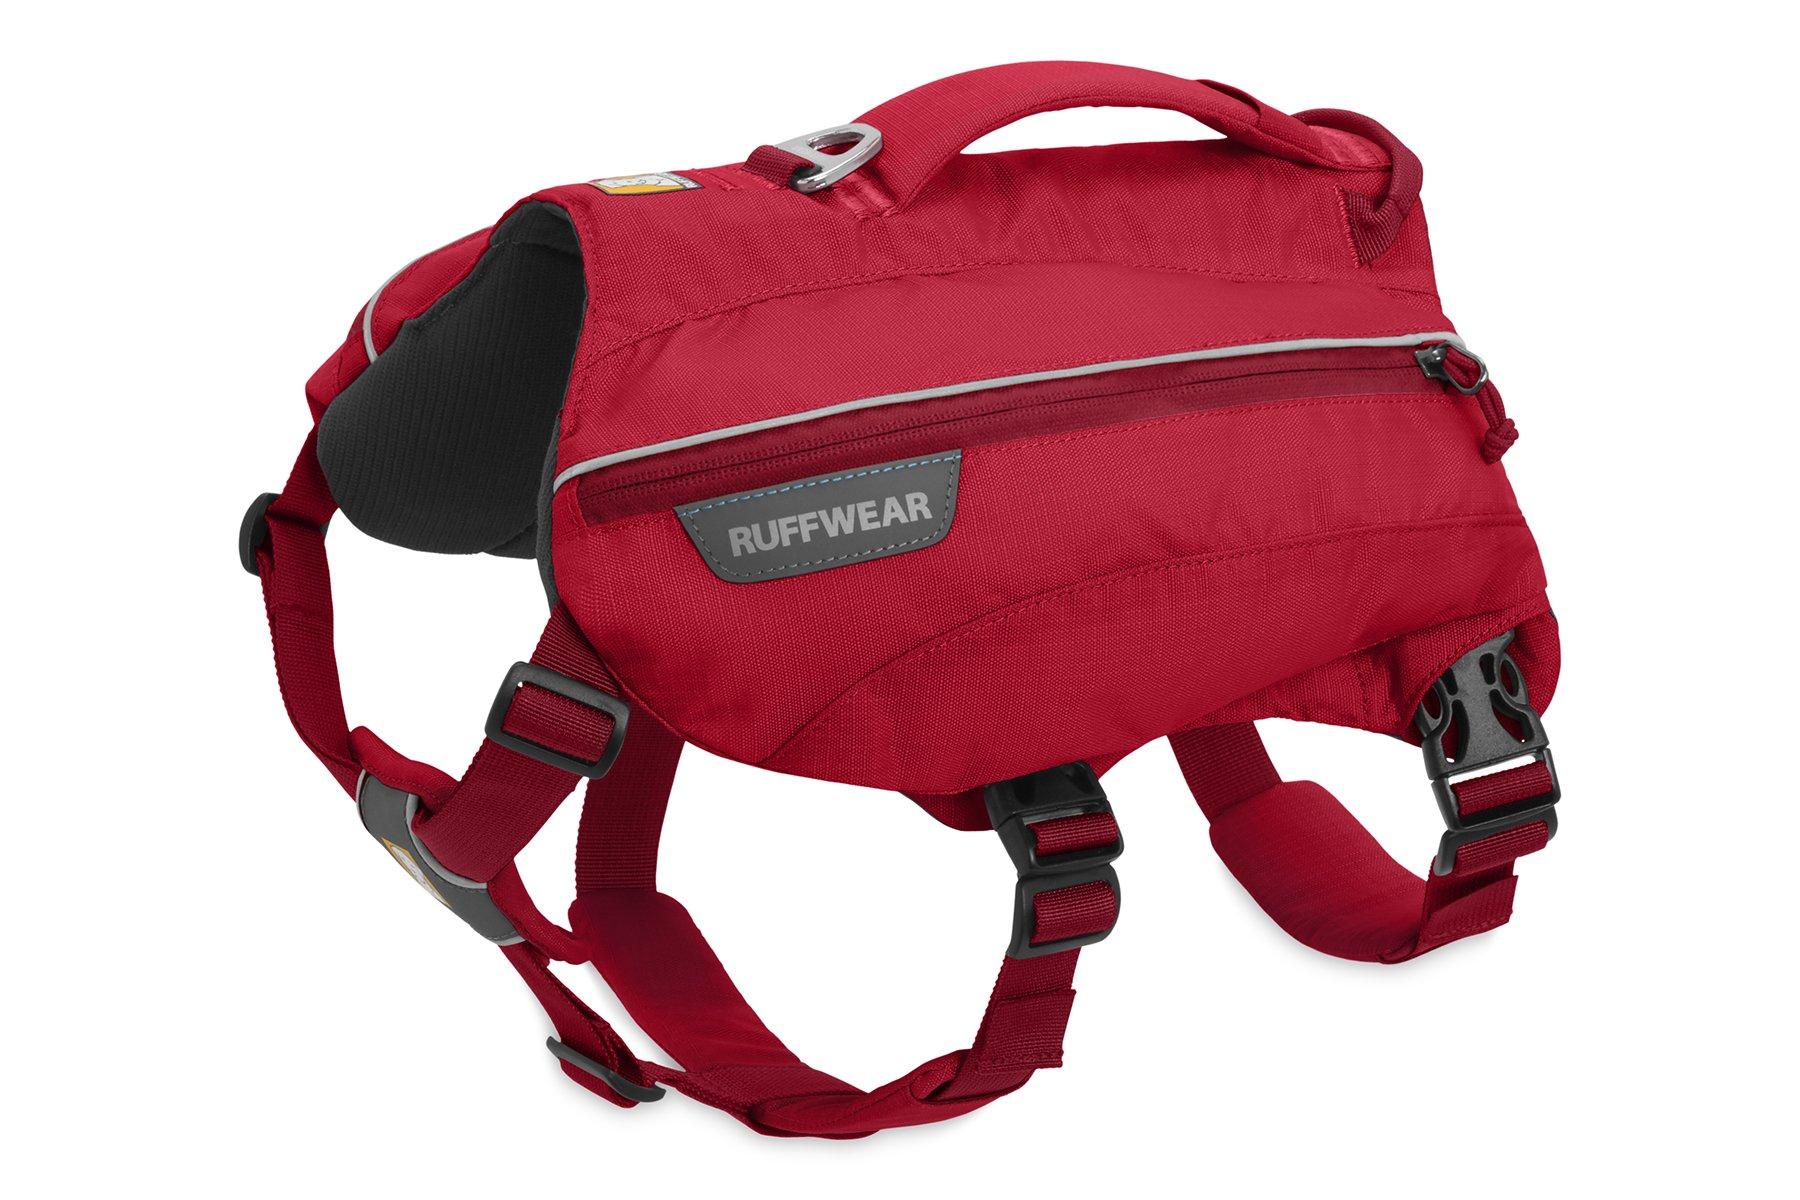 RUFFWEAR - Singletrak Hydration Pack for Dogs, Red Currant, Medium by RUFFWEAR (Image #4)